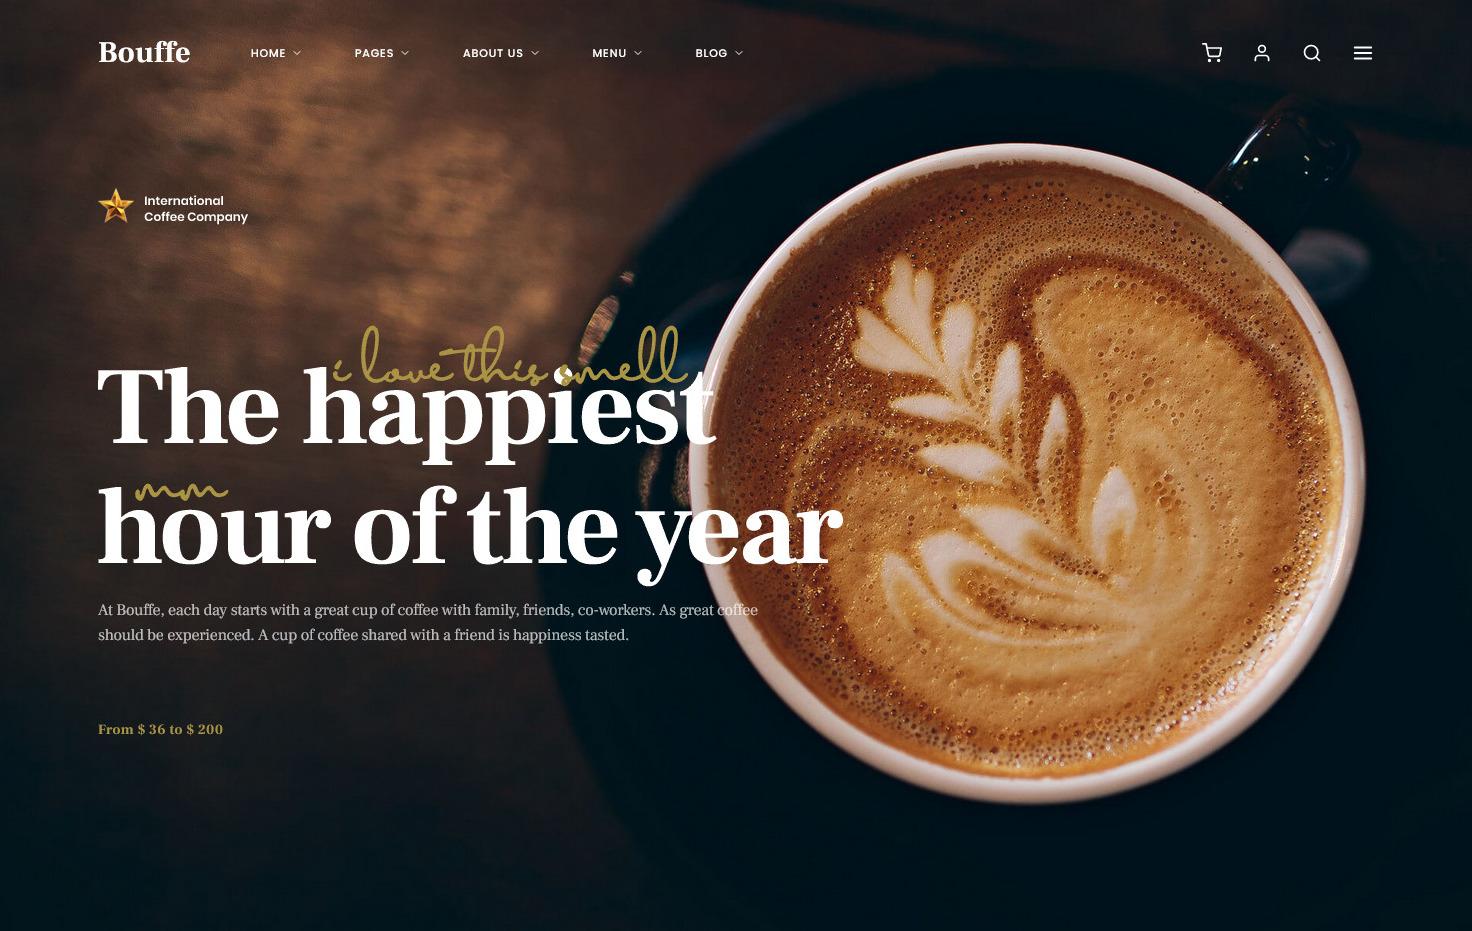 Bouffe Coffee Shop WordPress Theme